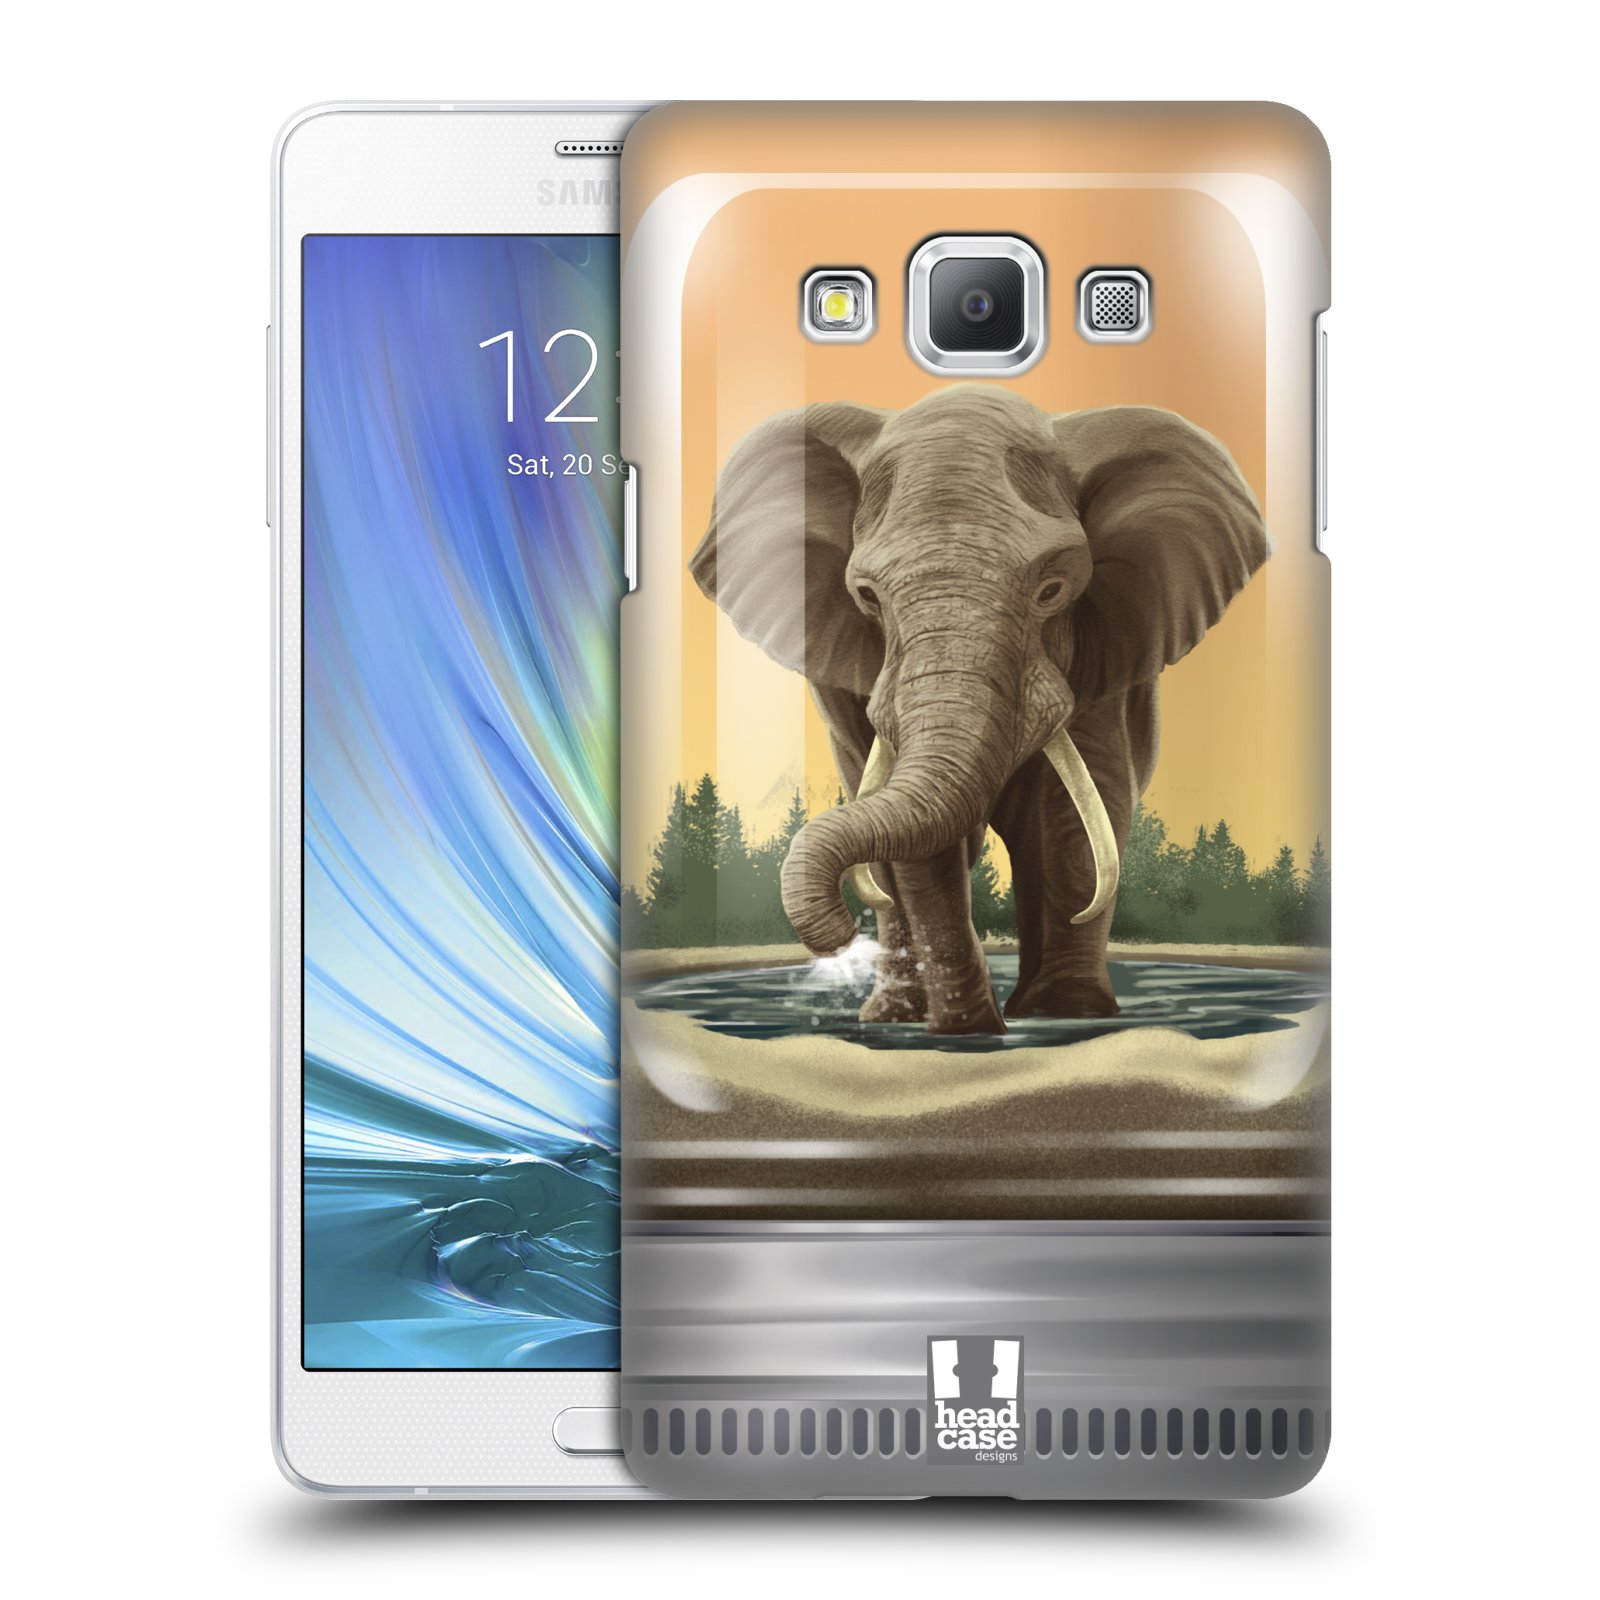 HEAD CASE plastový obal na mobil SAMSUNG GALAXY A7 vzor Zvířátka v těžítku slon